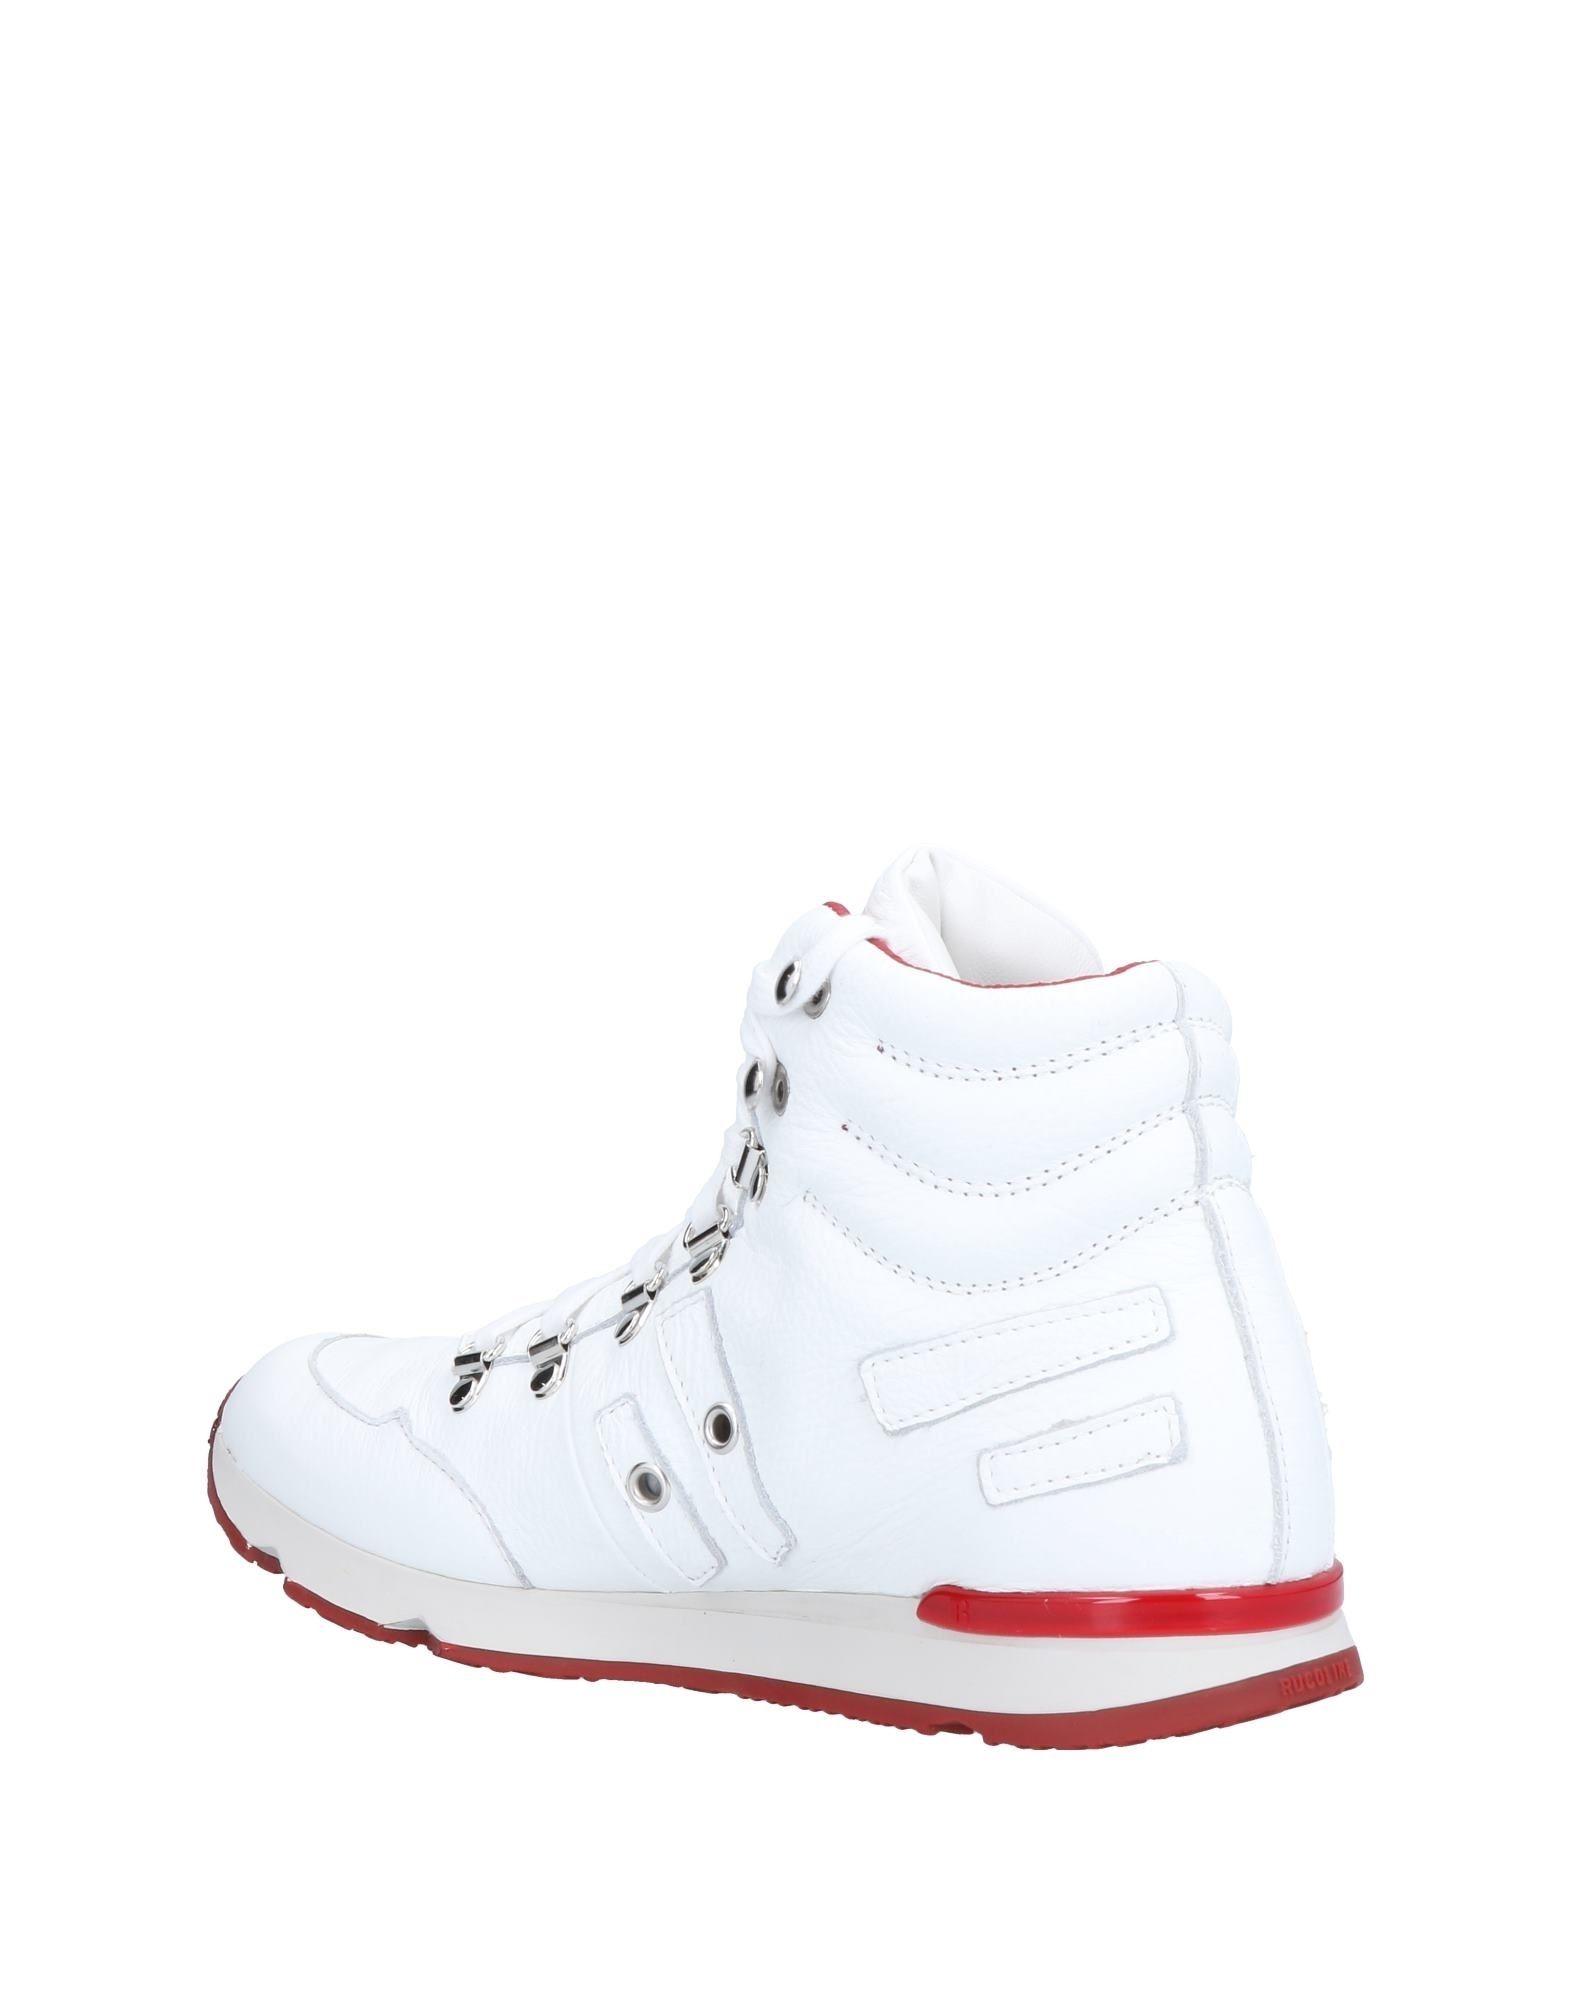 Ruco Line Gute Sneakers Damen  11496147KV Gute Line Qualität beliebte Schuhe f16a02